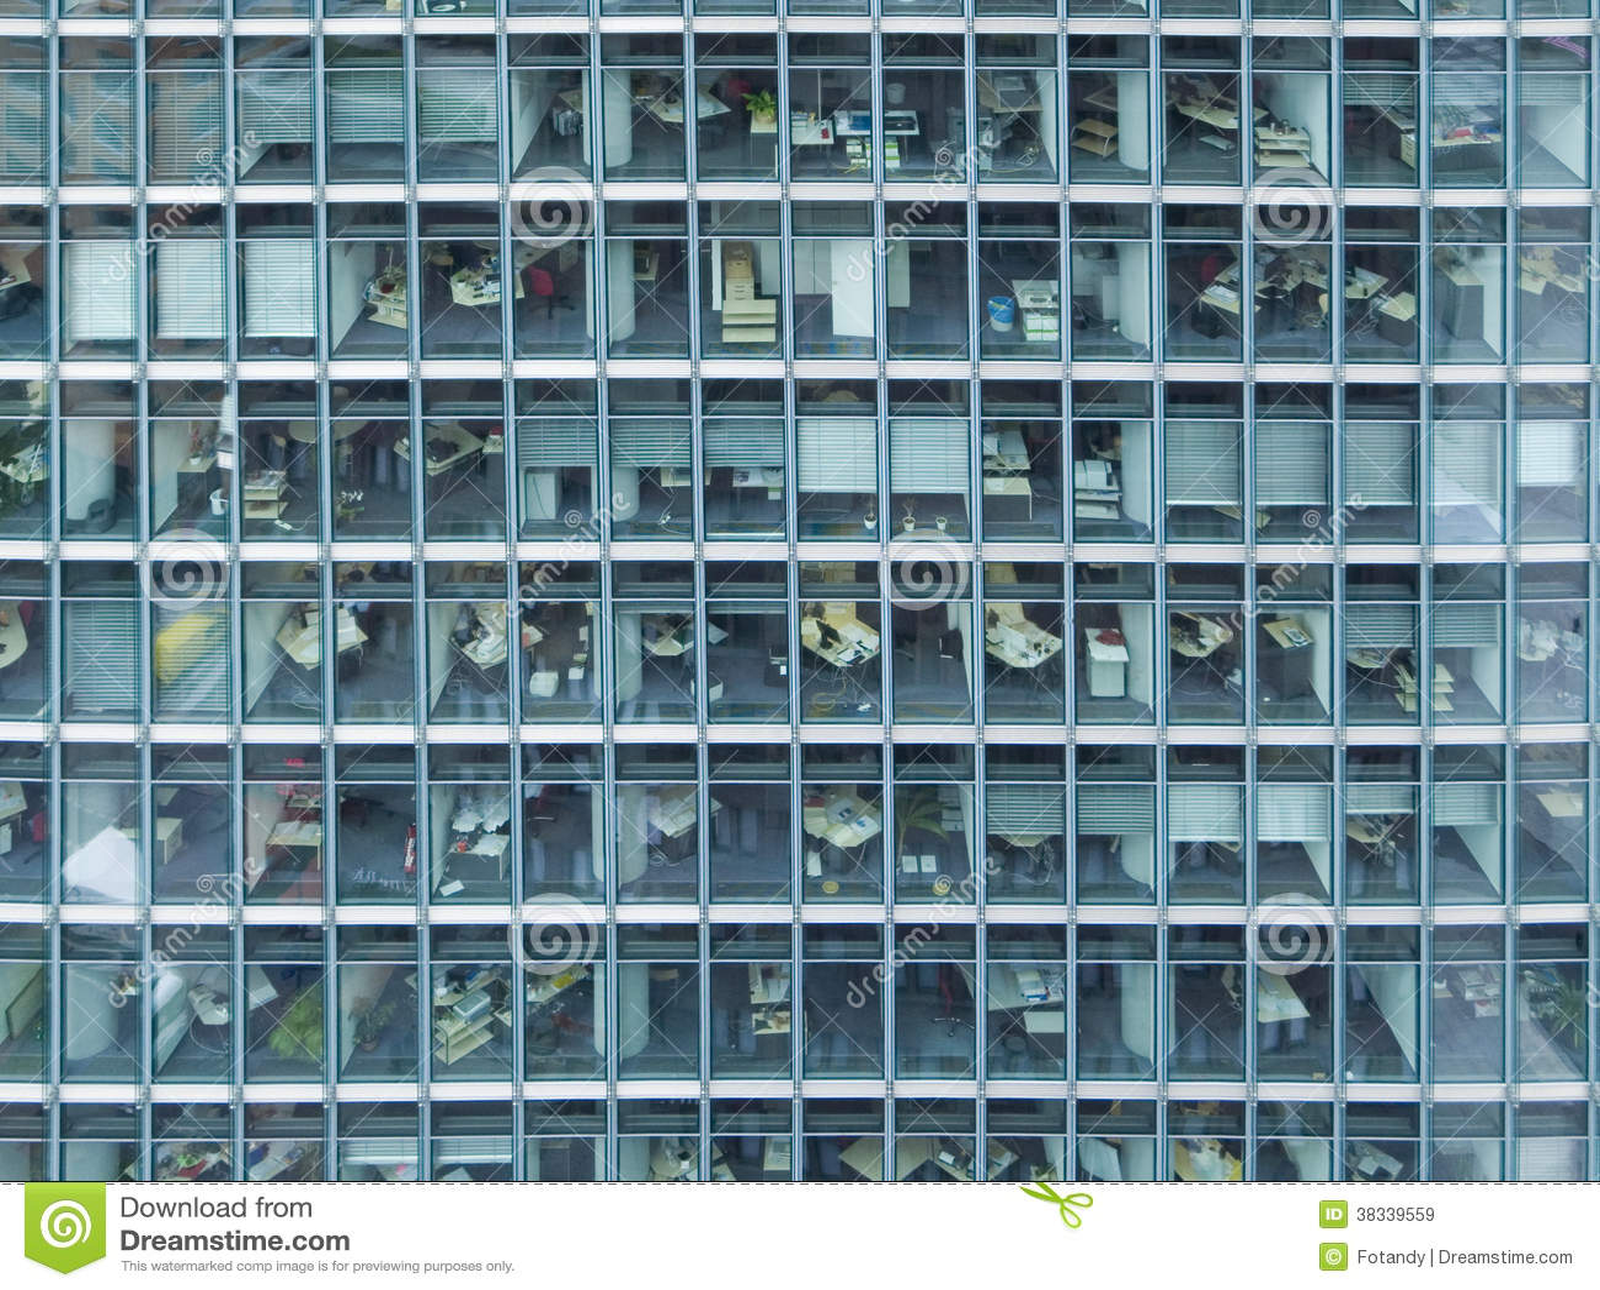 Fassade frontal  Fassade Von Büros Lizenzfreie Stockbilder - Bild: 38339559